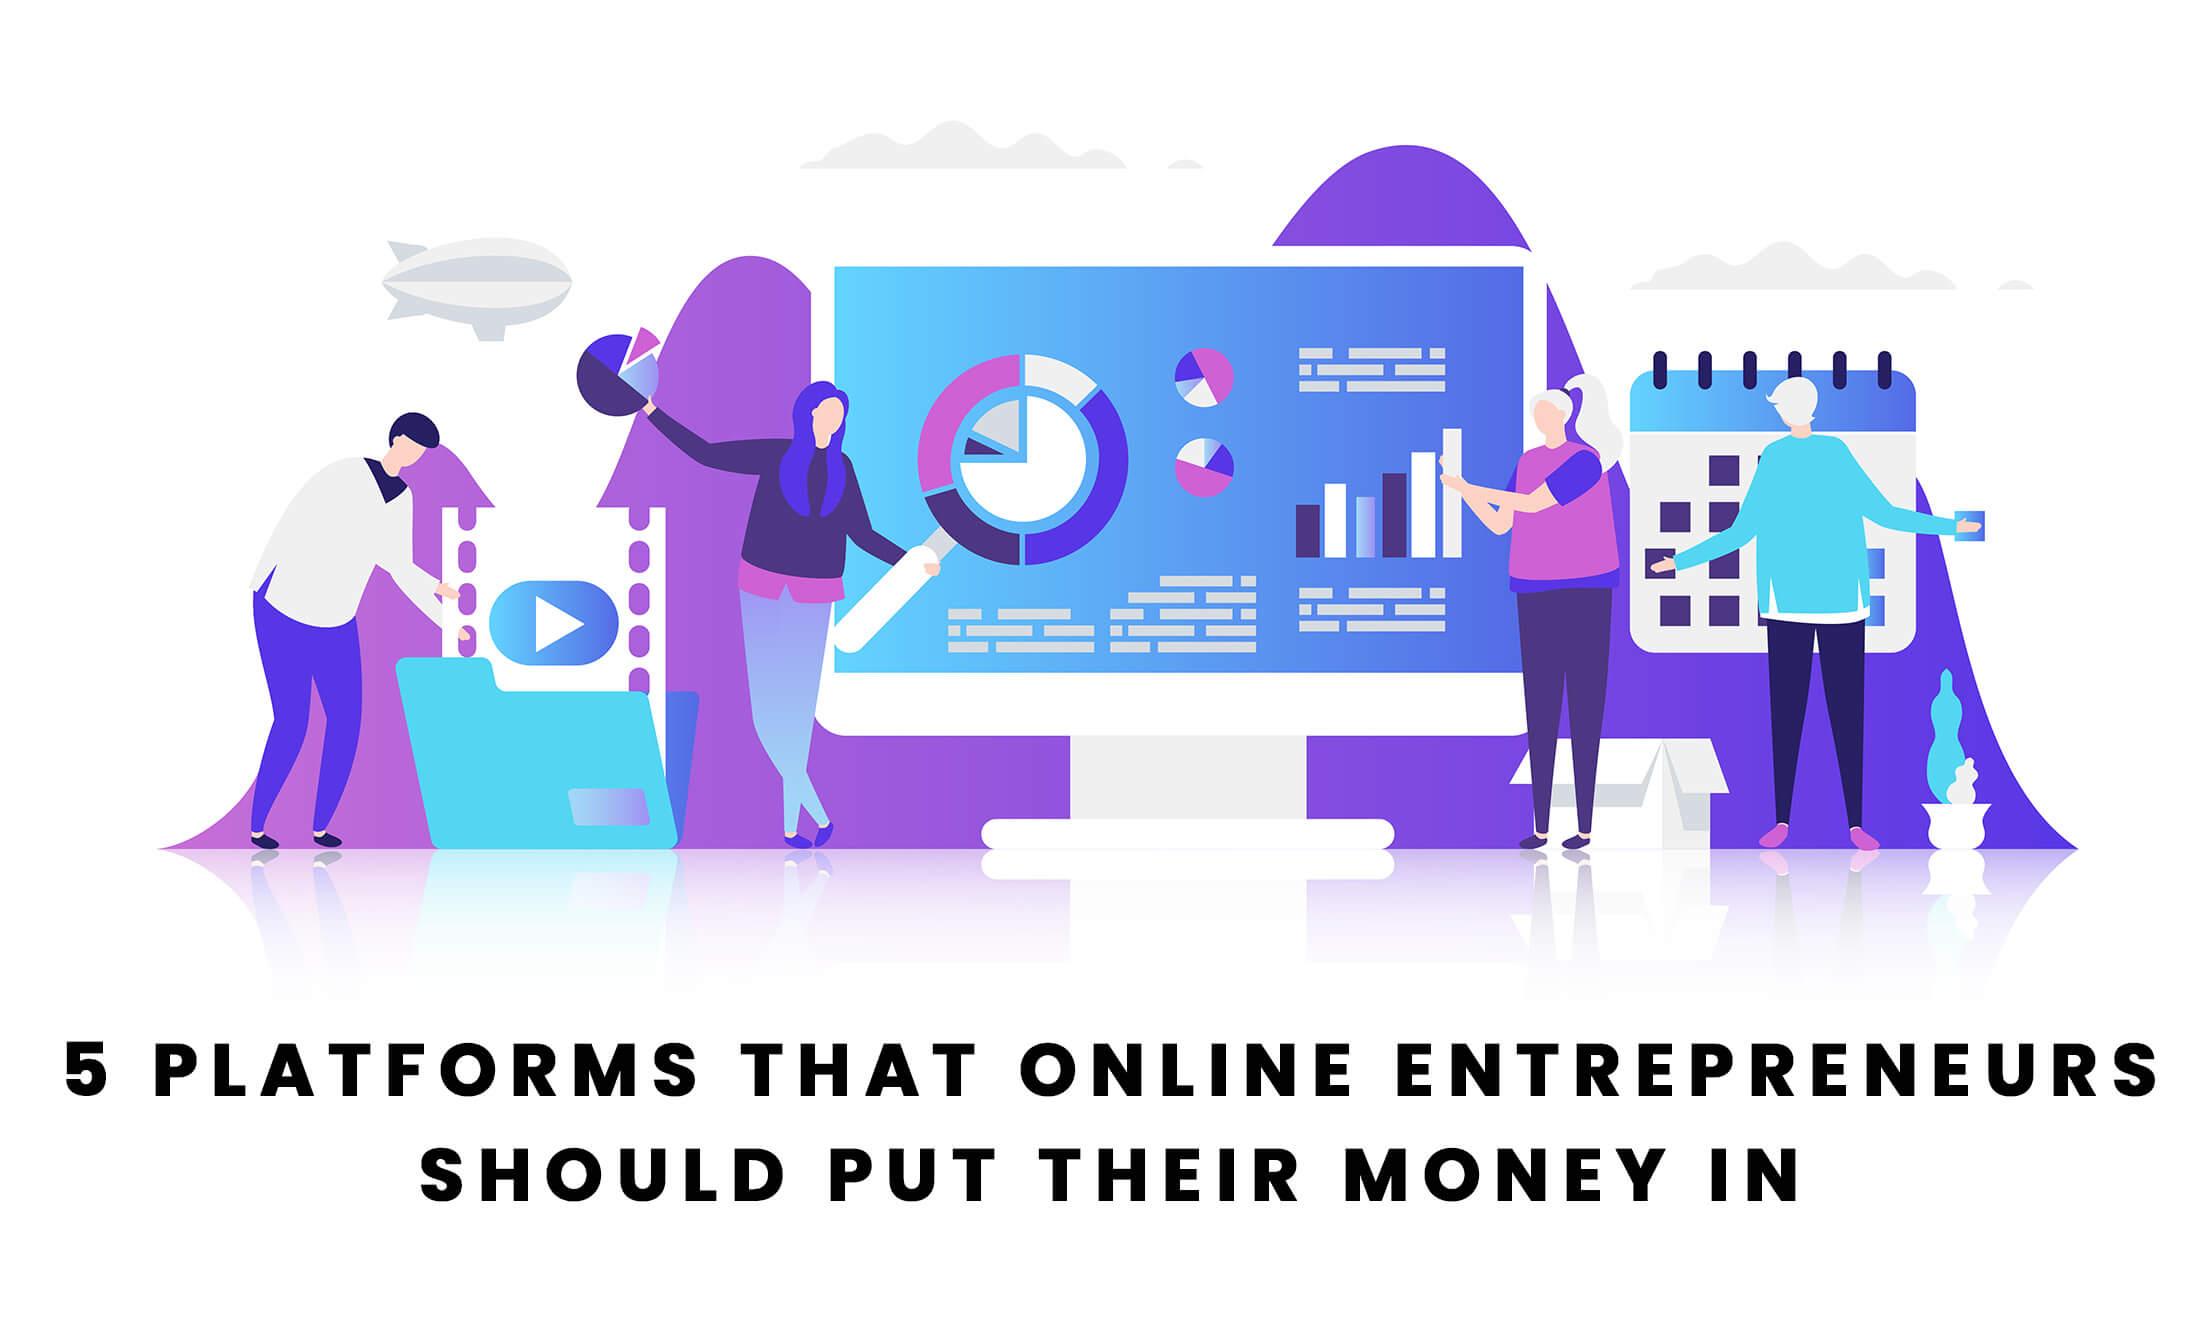 5 Platforms that Online Marketers Should Put Their Money In